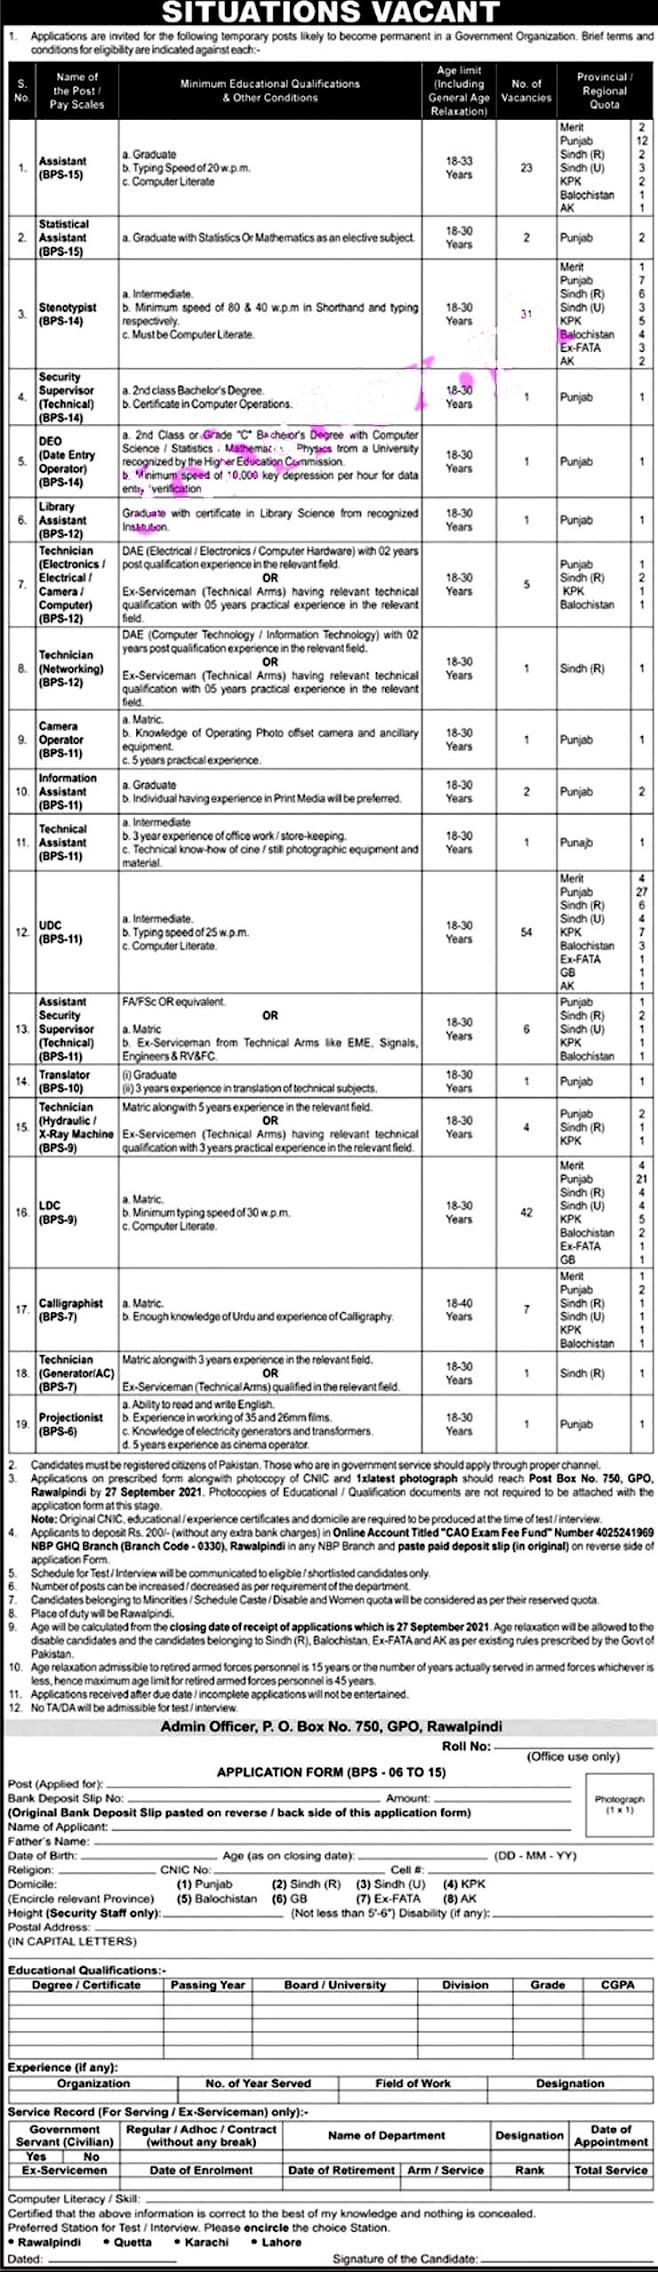 Pakistan Army PO Box No 750 GPO Rawalpindi 2021 Latest Jobs